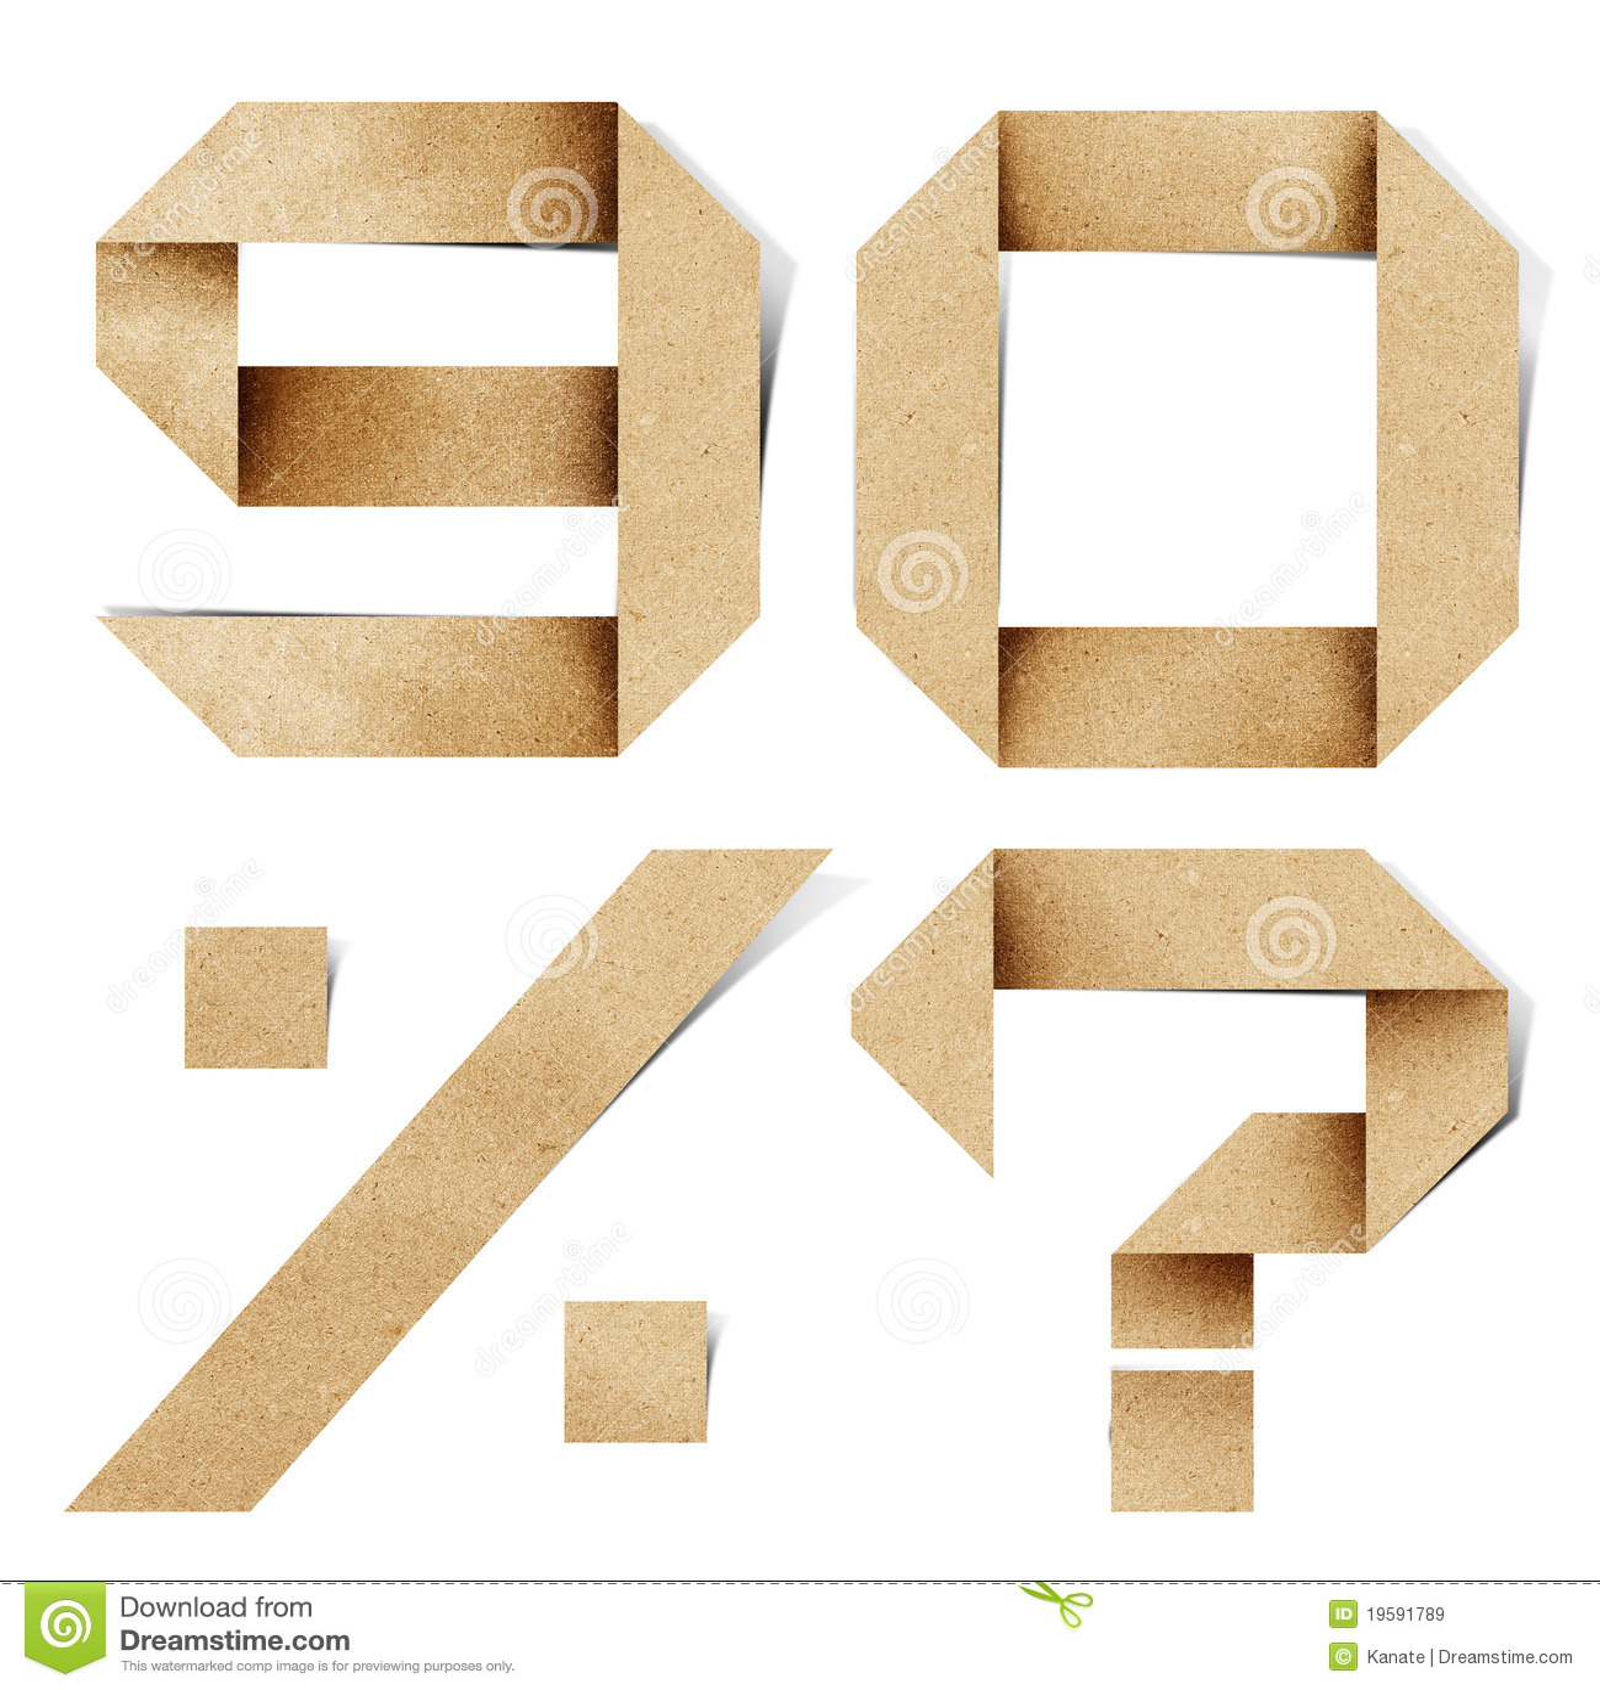 Origami animals free download programhouston for Alphabet letters cardboard